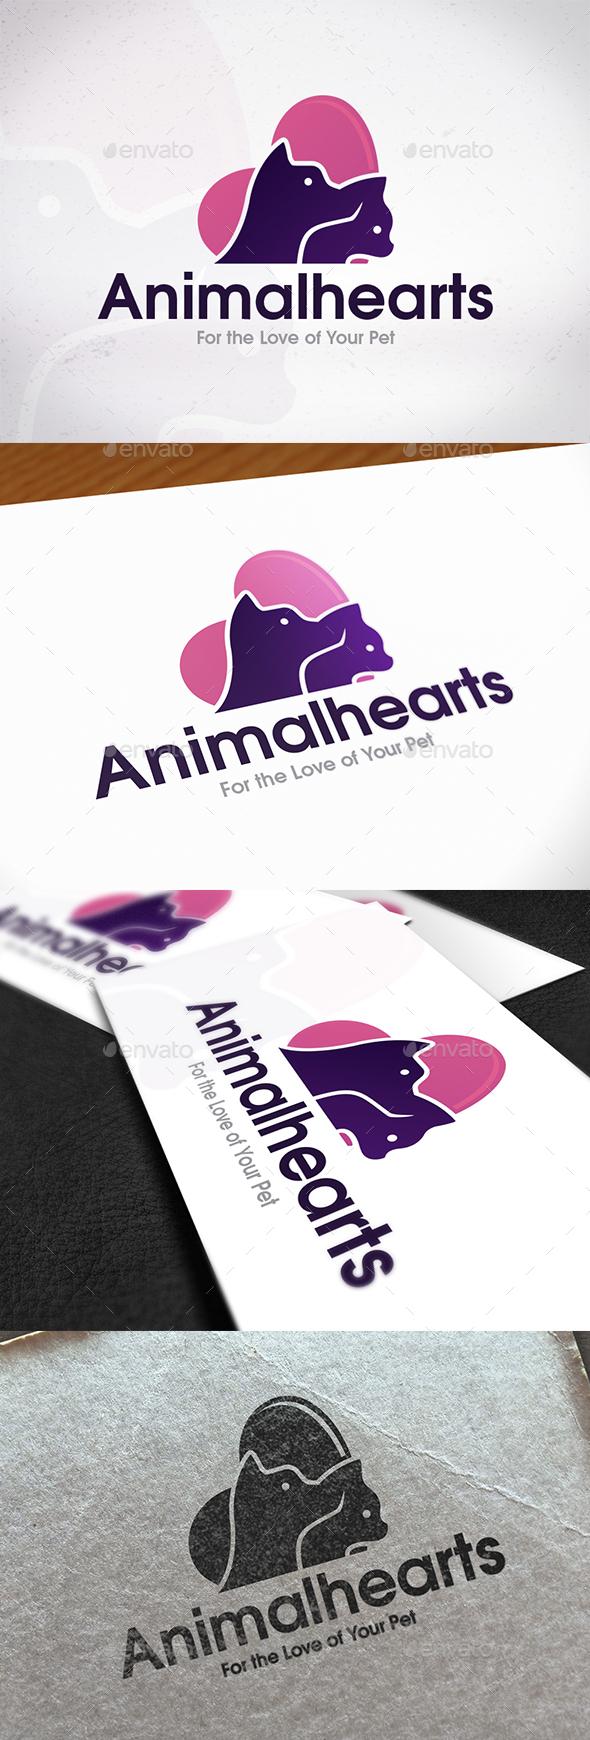 Animal Hearts Logo Design - Animals Logo Templates